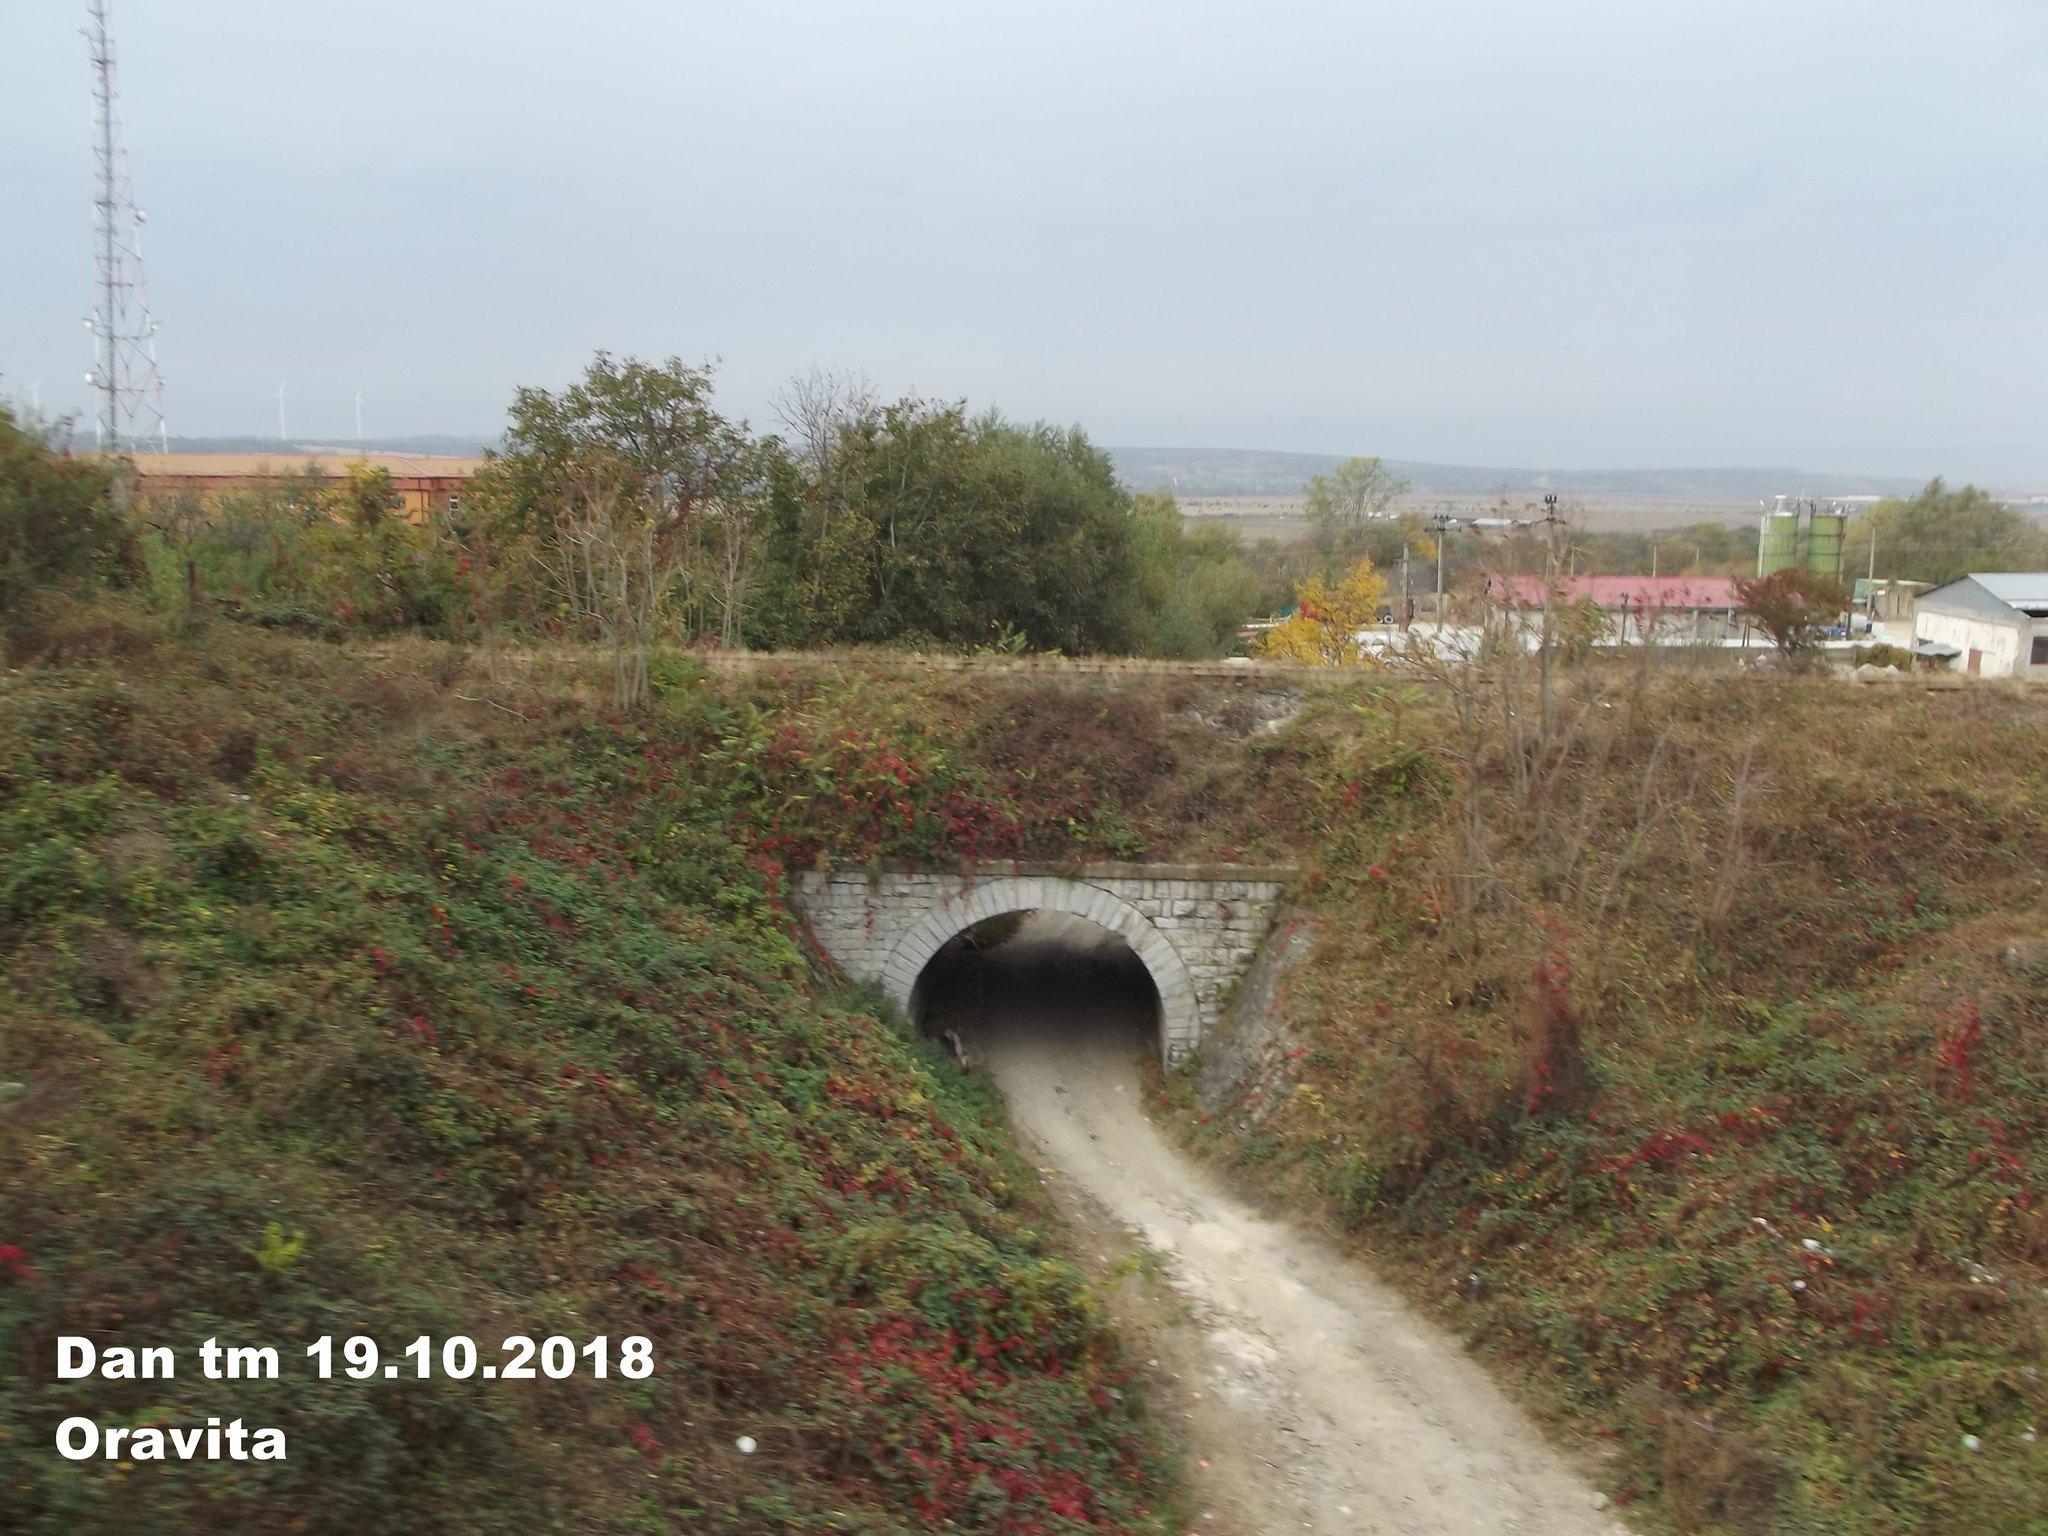 925 : Oravita - Anina - Pagina 40 43654018000_f73cbbcf33_k